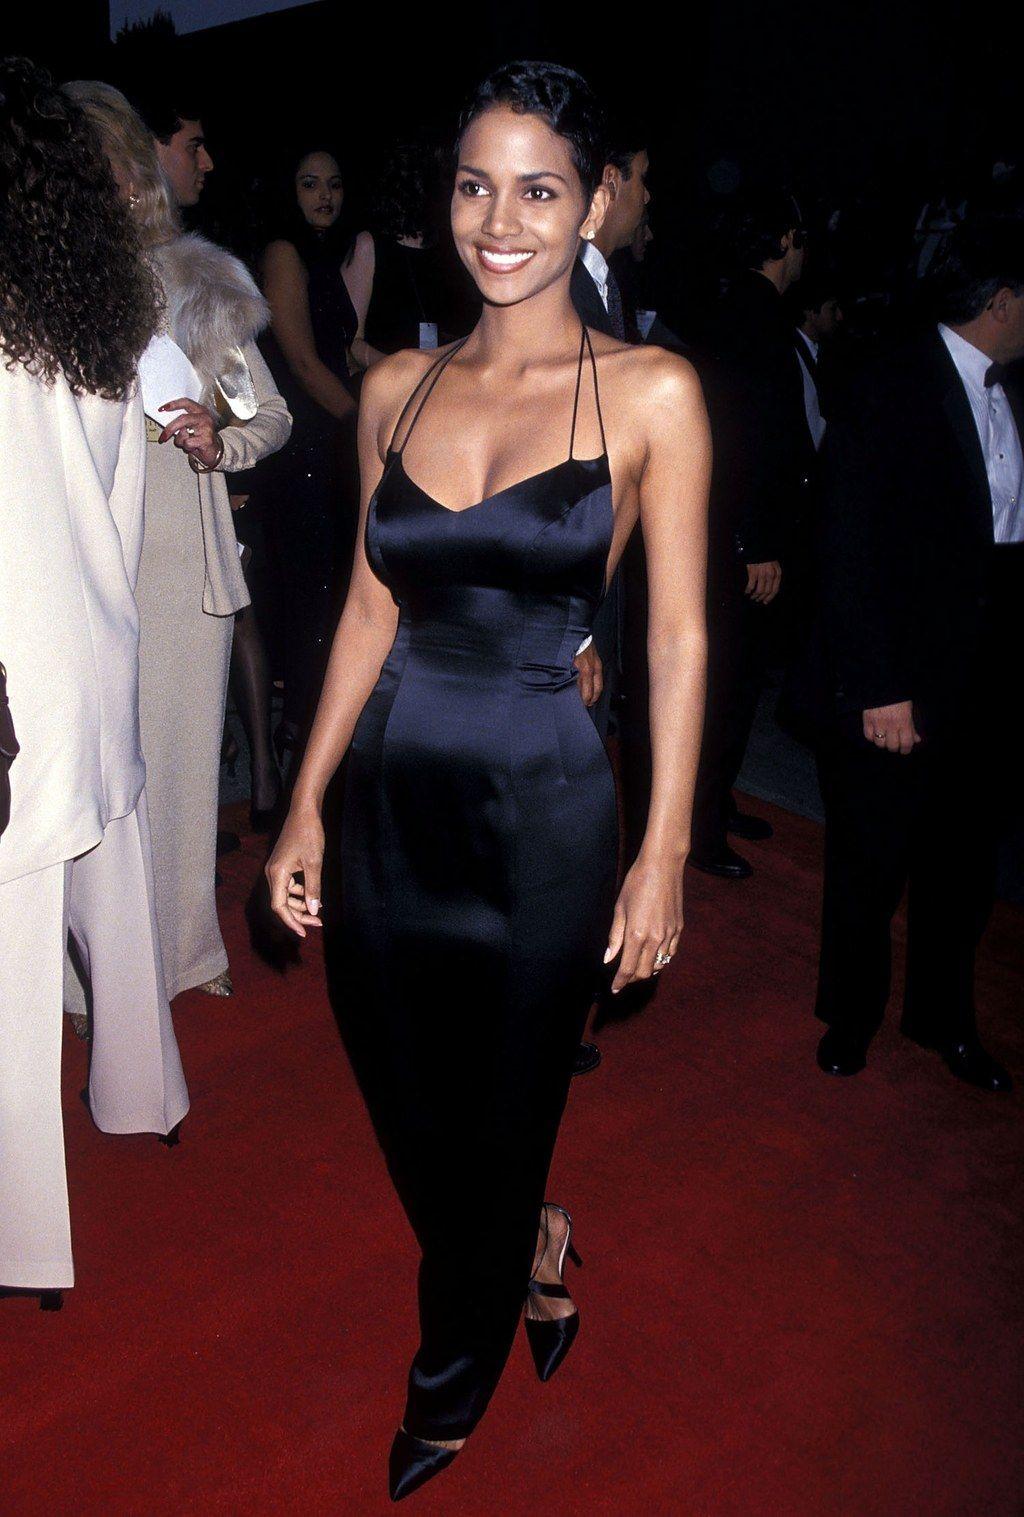 Halle Berry Black Dress Sag Awards 1995 Halle Berry Style Fashion 90s Red Carpet [ 1517 x 1024 Pixel ]